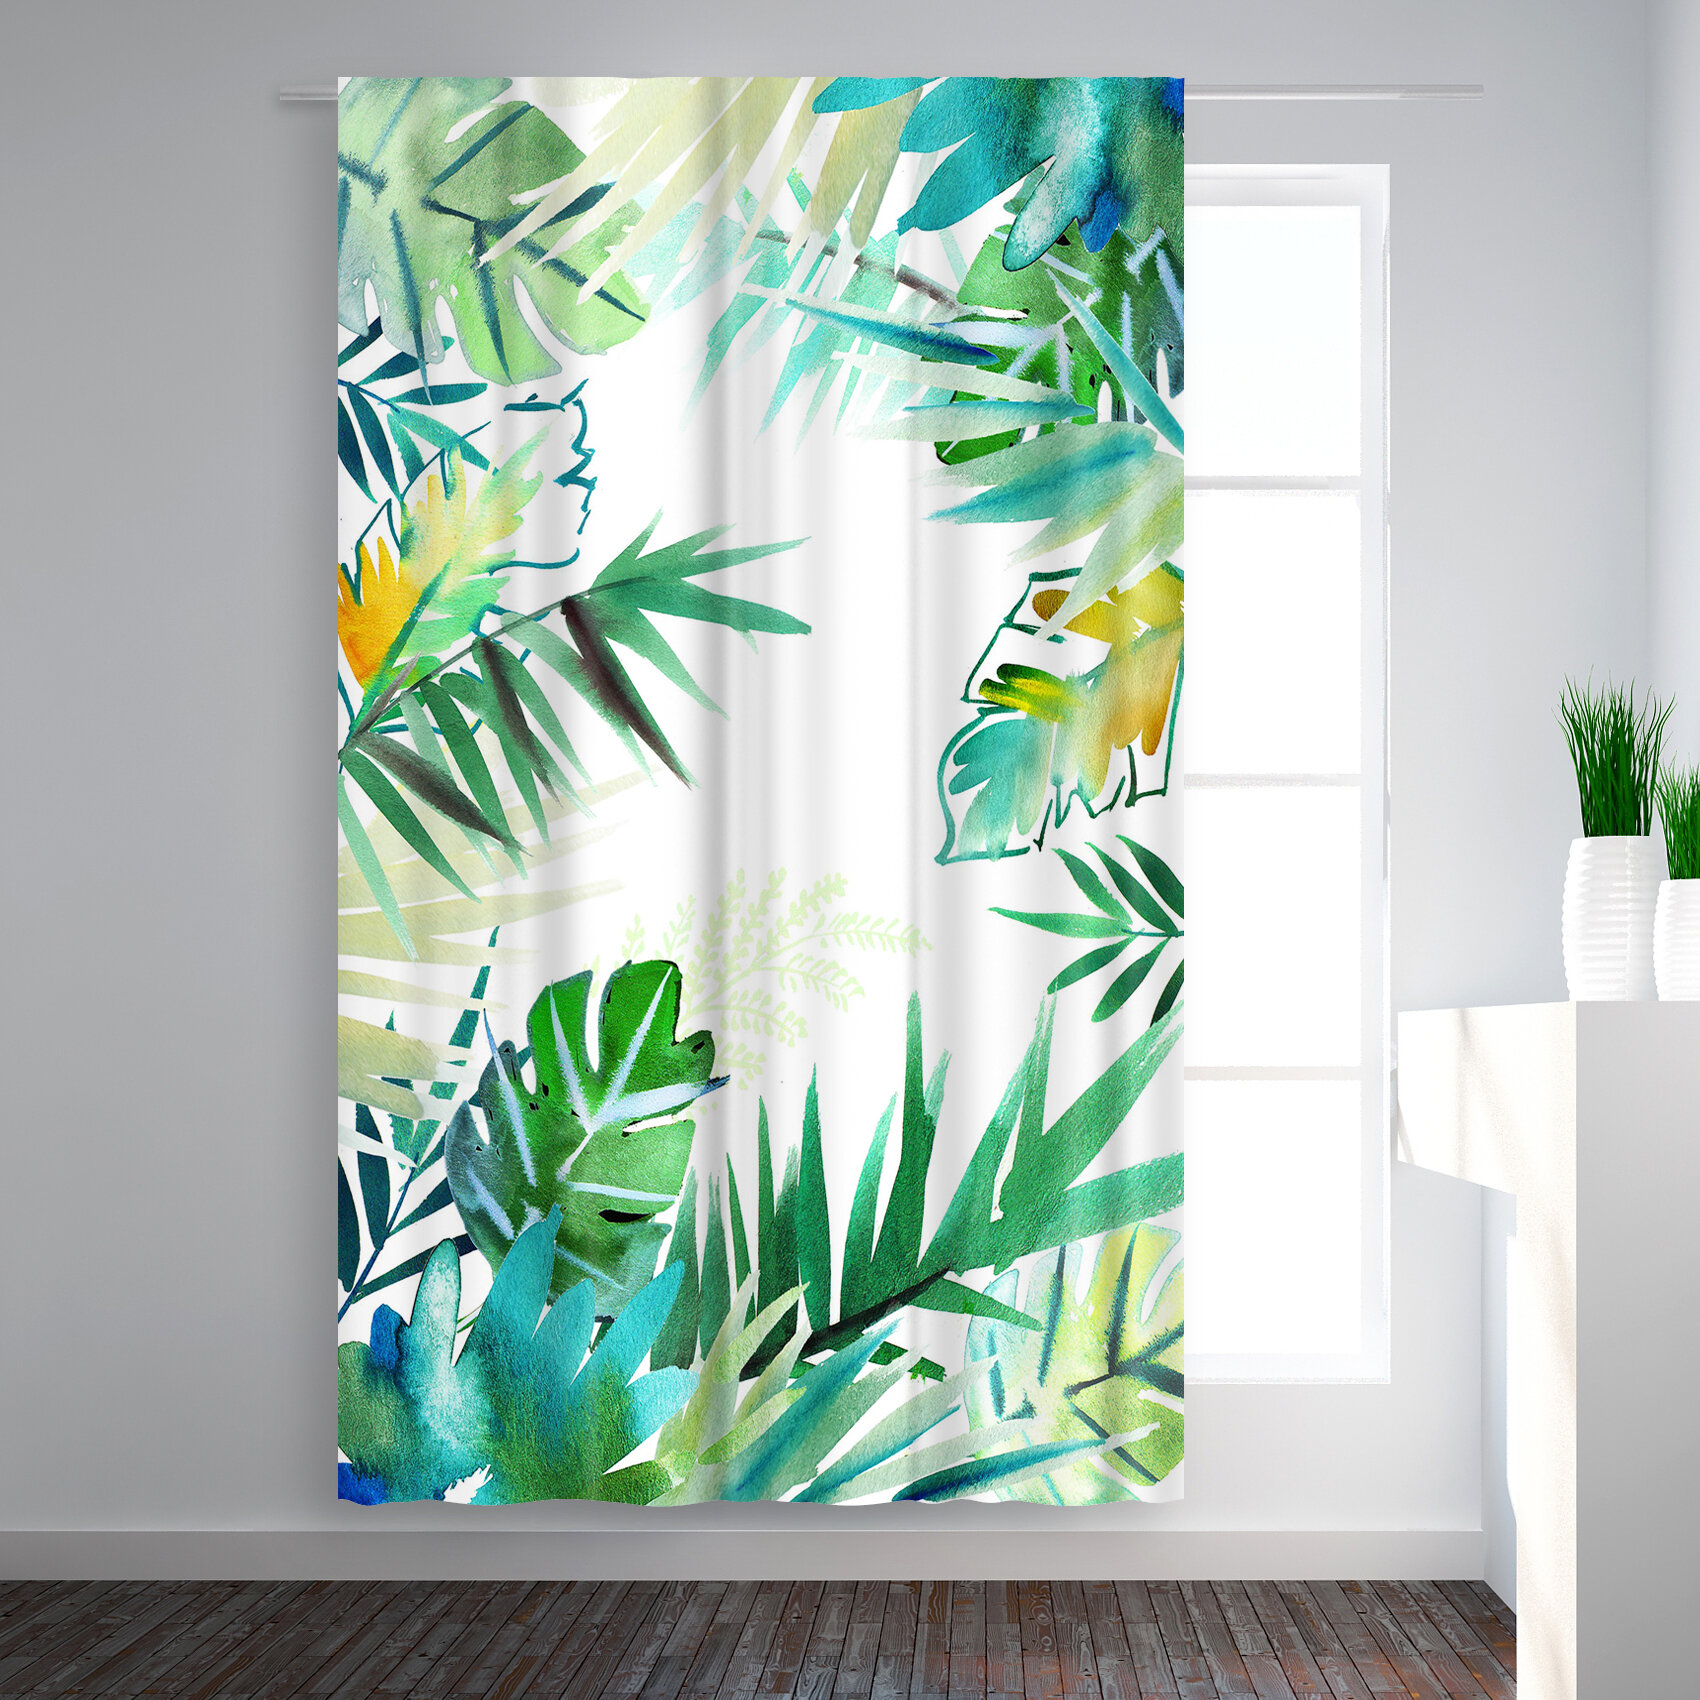 East Urban Home Victoria Nelson Tropical Foliage Floral Blackout Rod Pocket Single Curtain Panel Wayfair